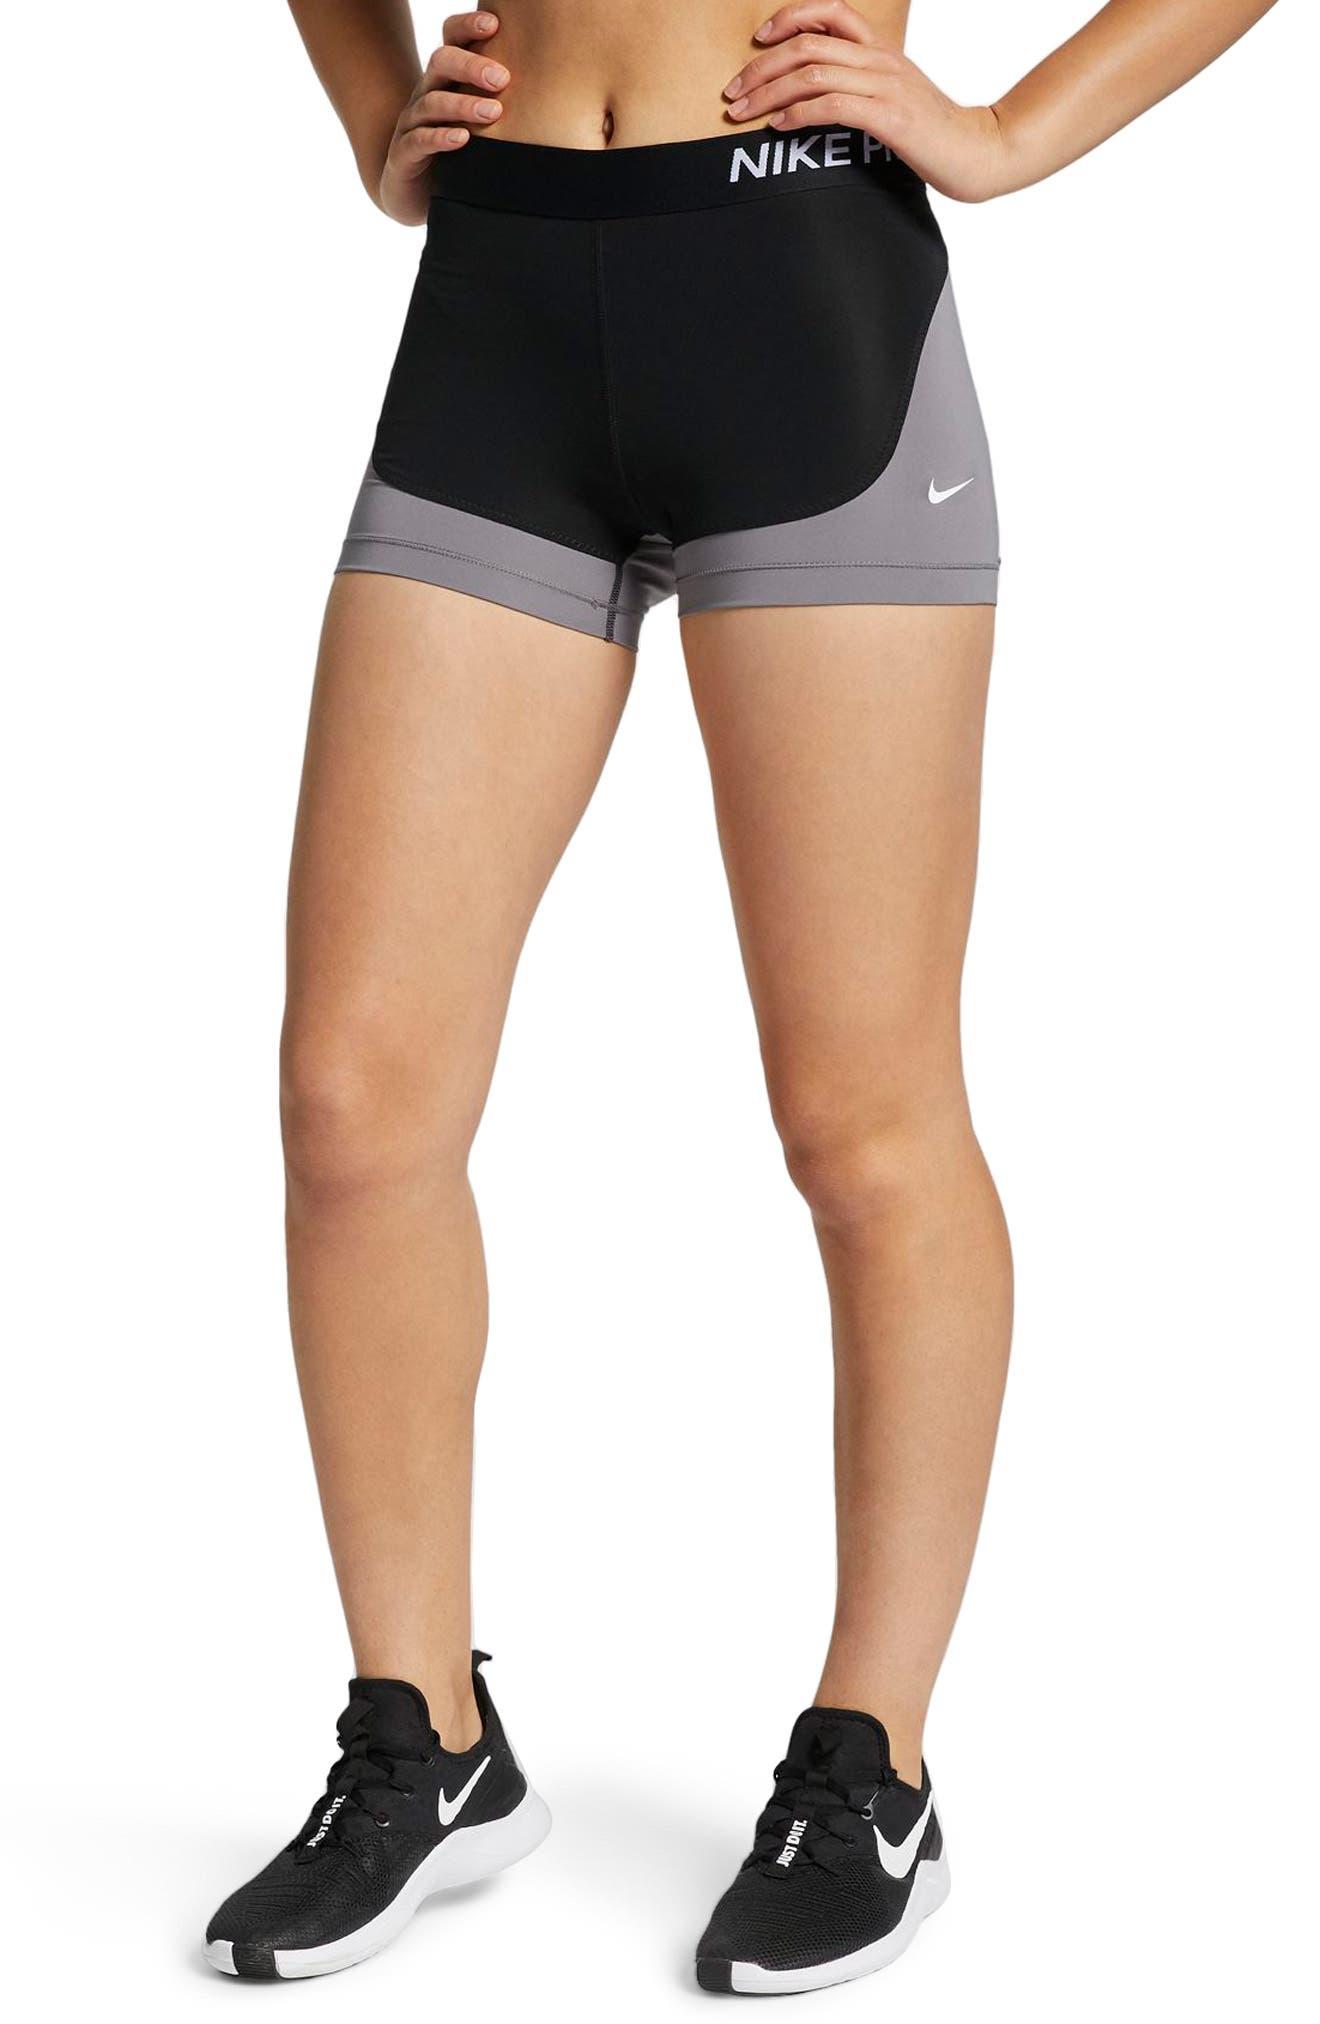 Nike Pro Compression Shorts, Black